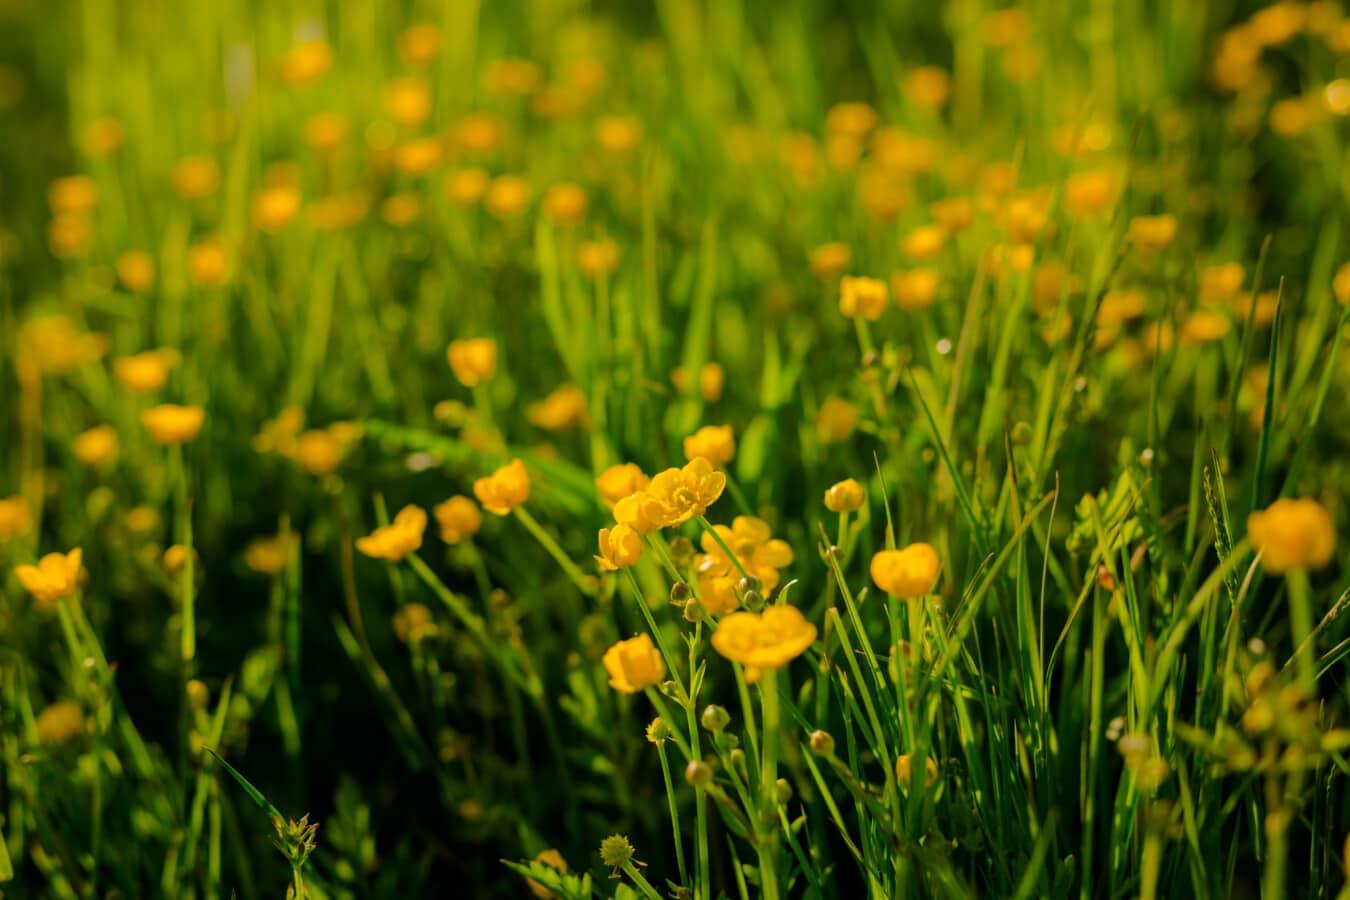 yellowish, wildflower, grassland, grass, field, fair weather, plant, herb, nature, Ranunculus repens